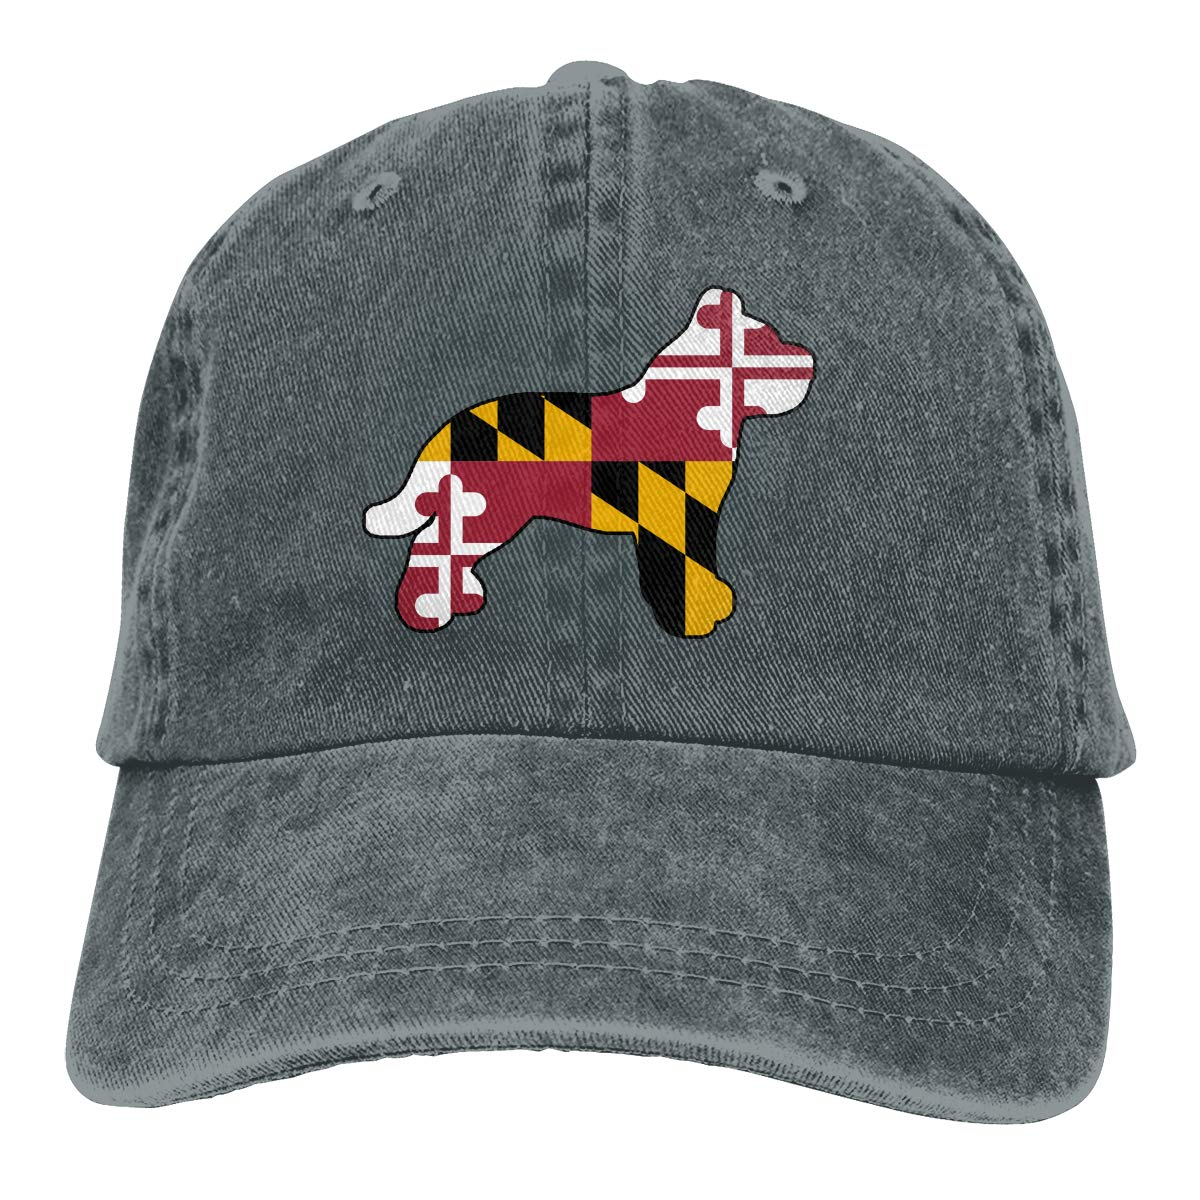 Maryland Flag Pitbull Mens Womens Adjustable Yarn-Dyed Baseball Cap Hip-hop Cap